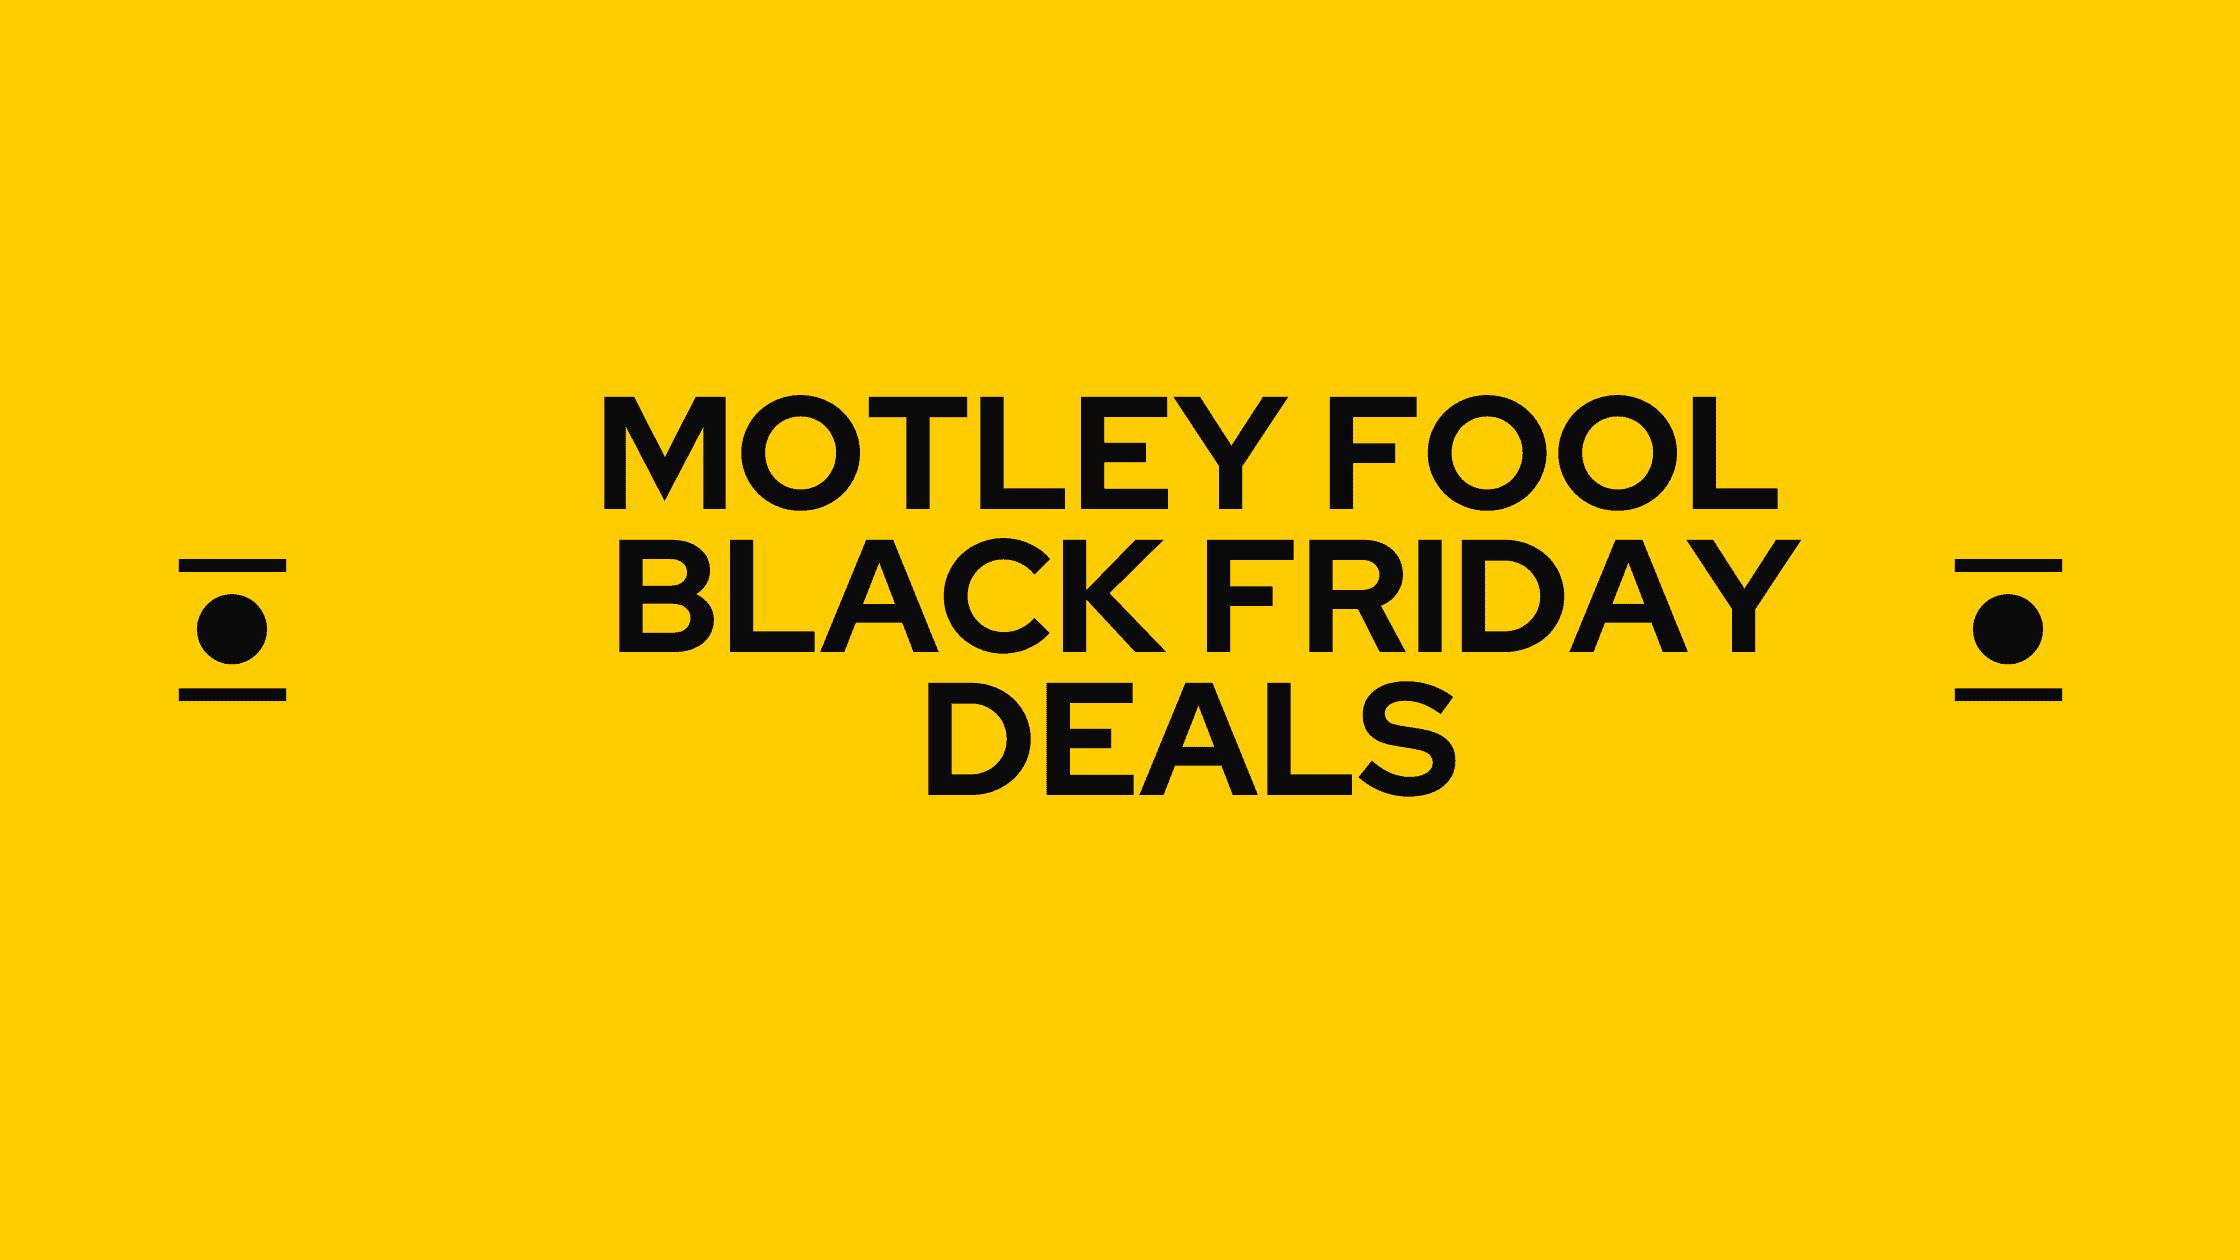 motley fool black friday